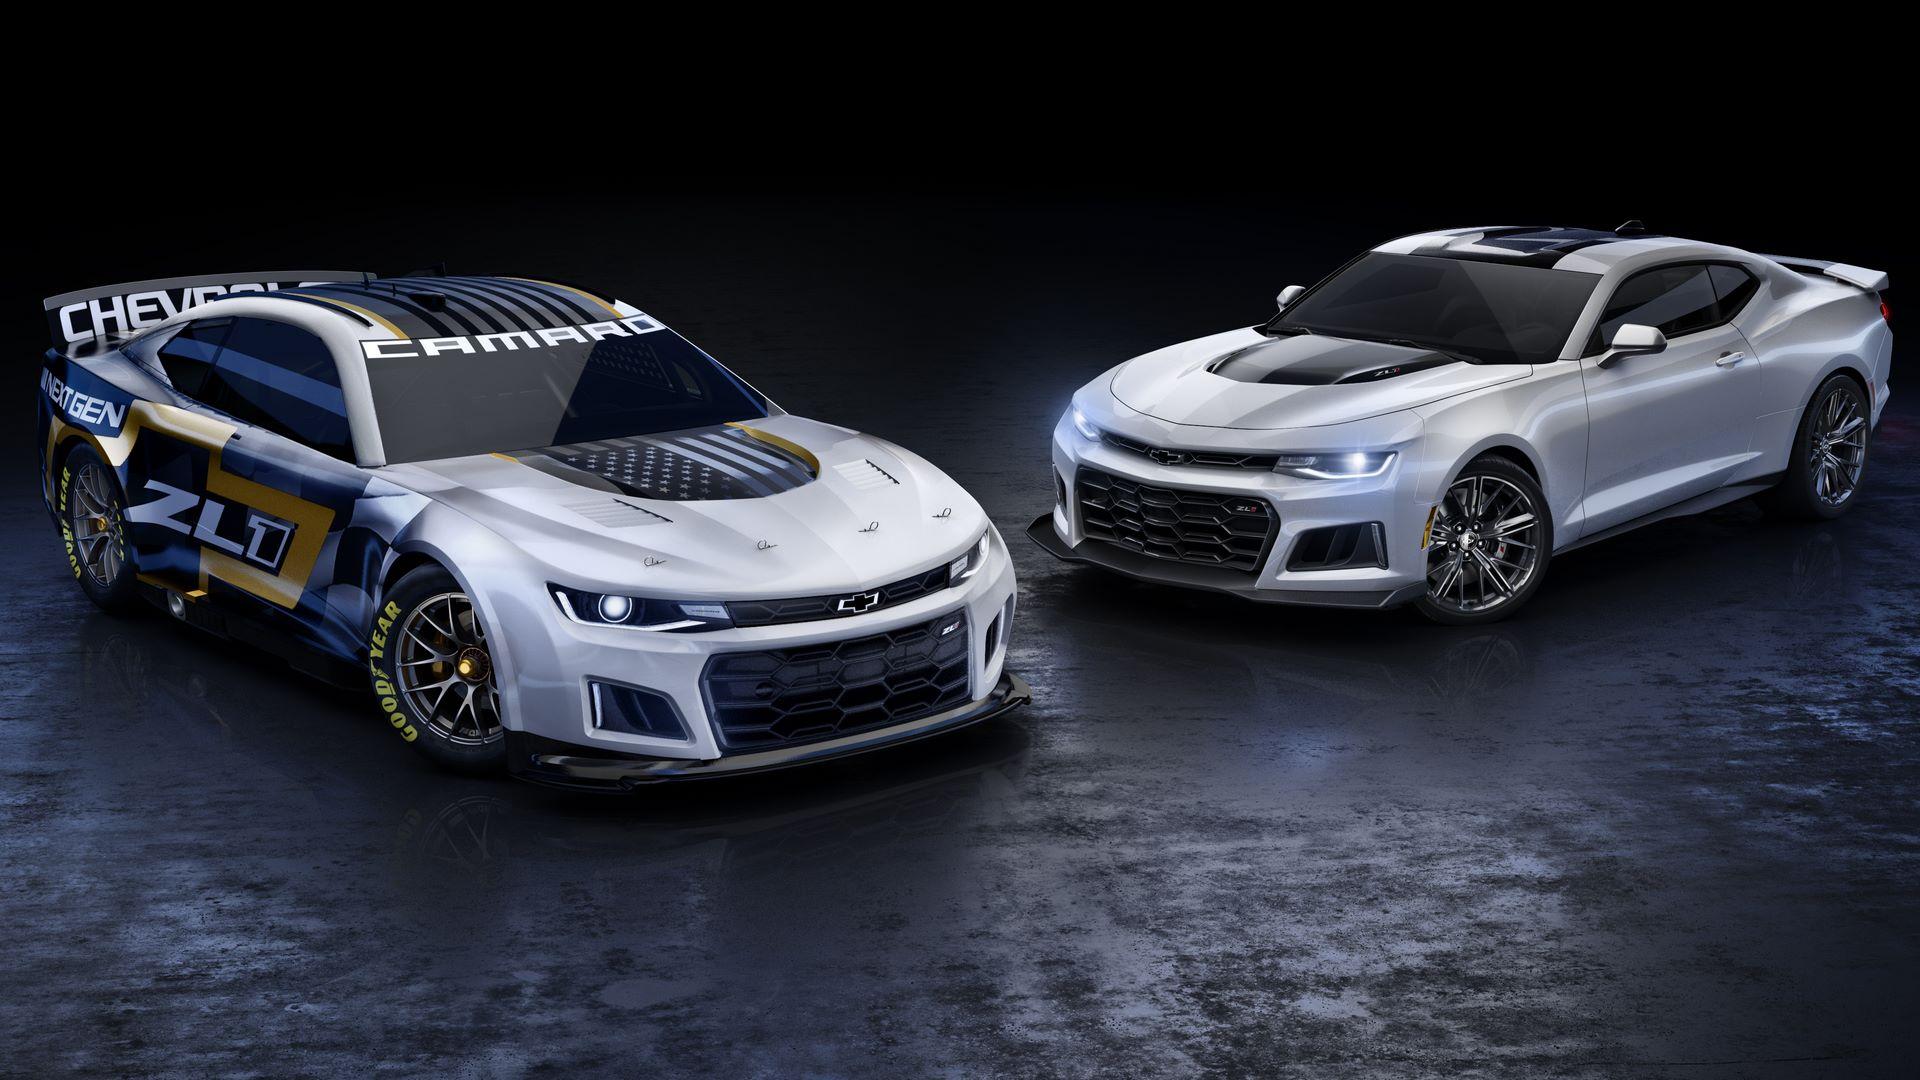 Chevrolet-Camaro-ZL1-RaceCarr-Next-Gen-Nascar-8